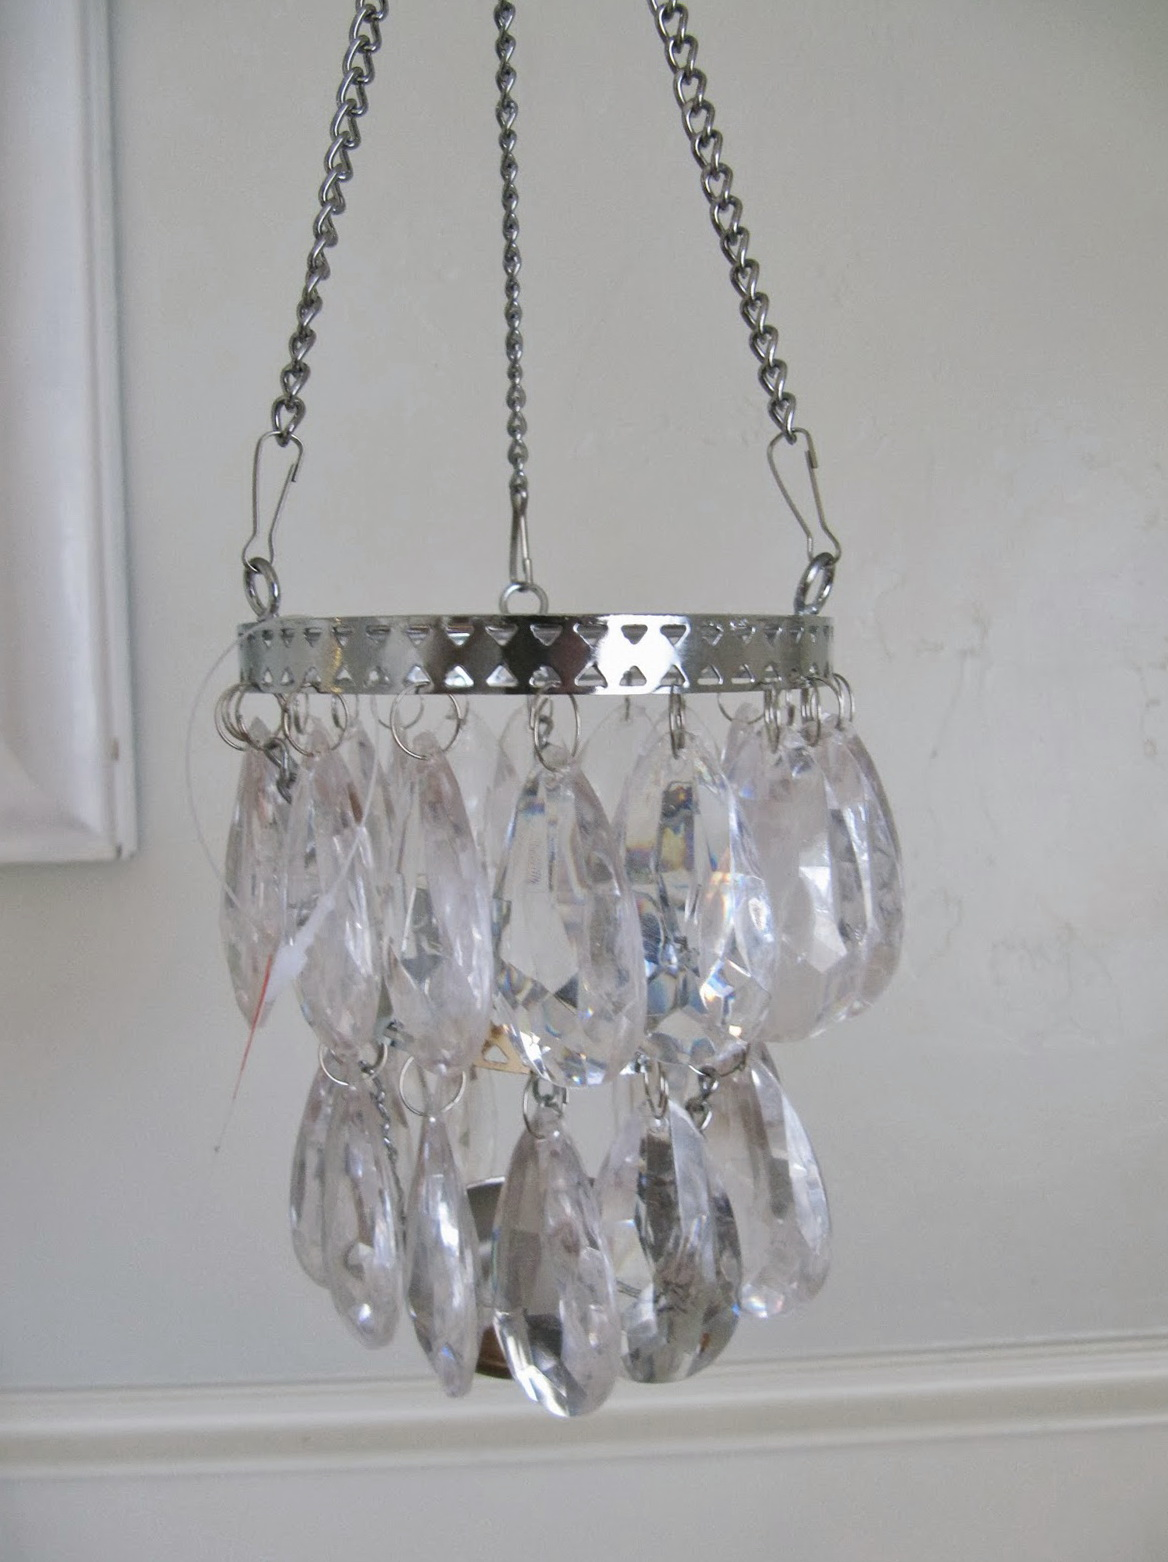 Diy crystal chandelier makeover home design ideas diy crystal chandelier makeover mozeypictures Choice Image